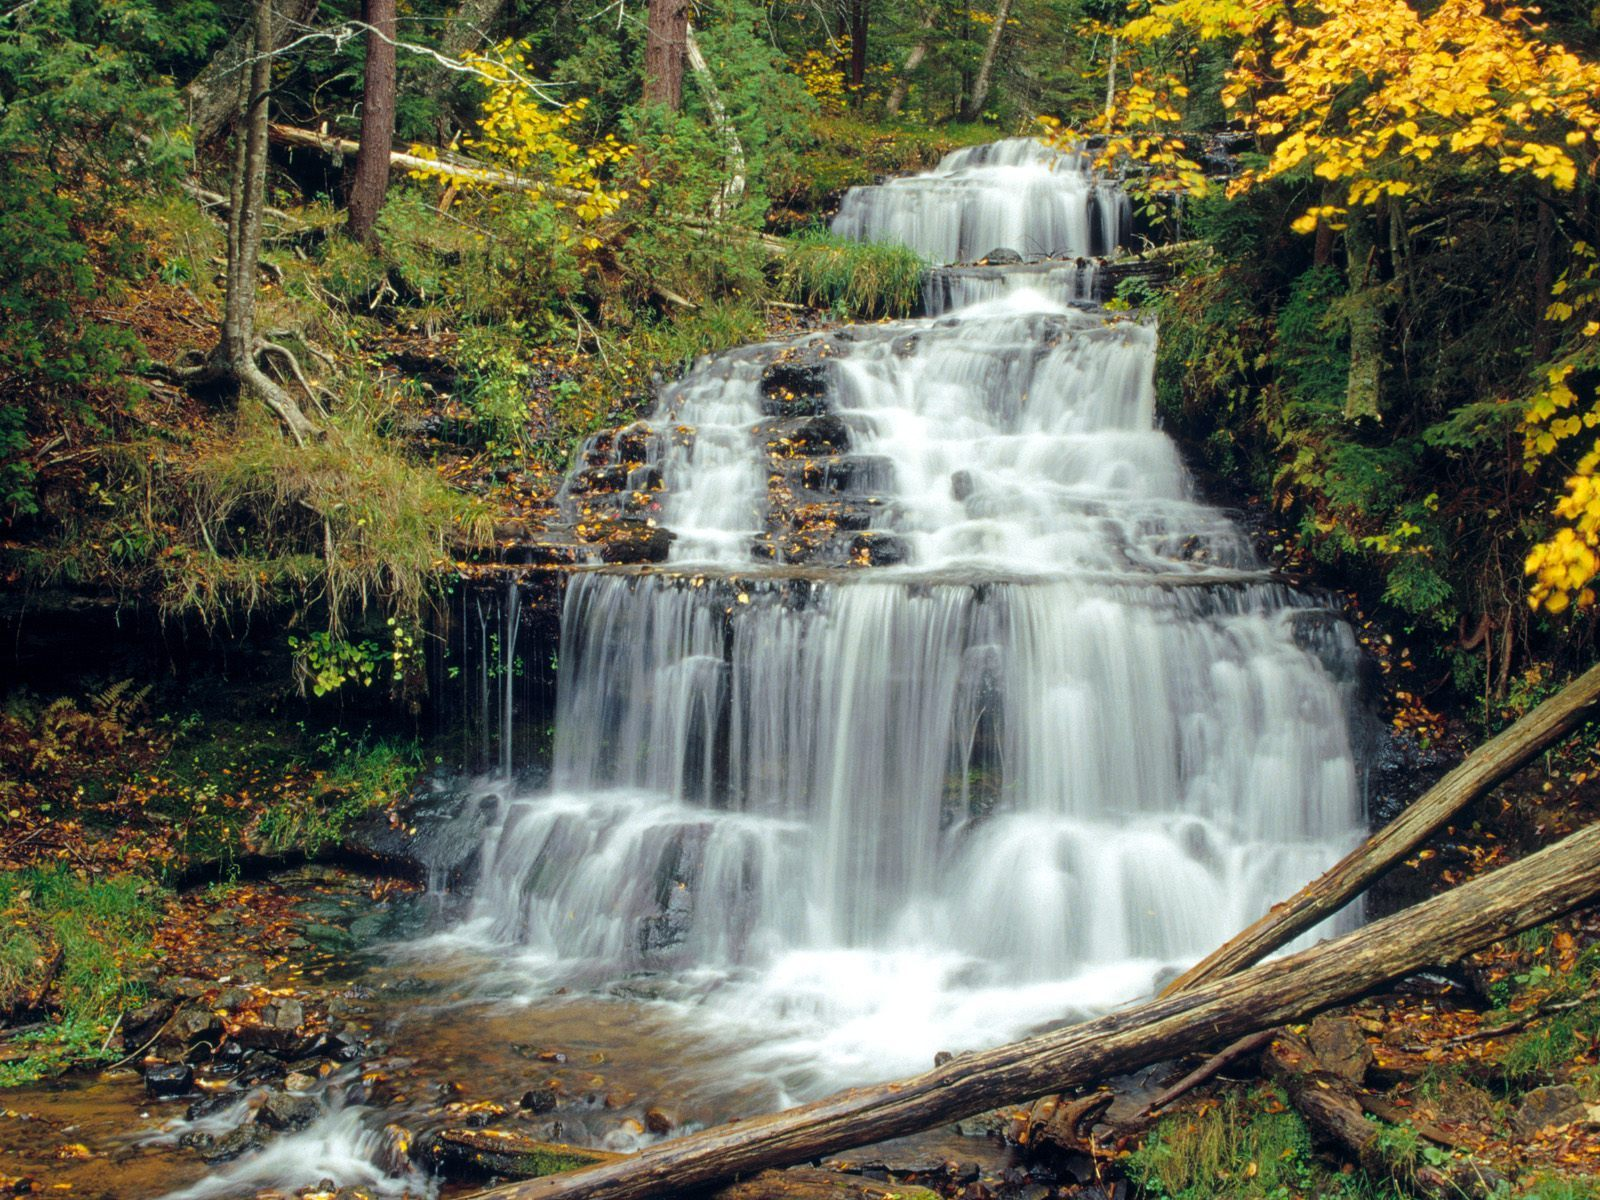 Mountains Waterfalls Wallpaper 5833989 1600x1200